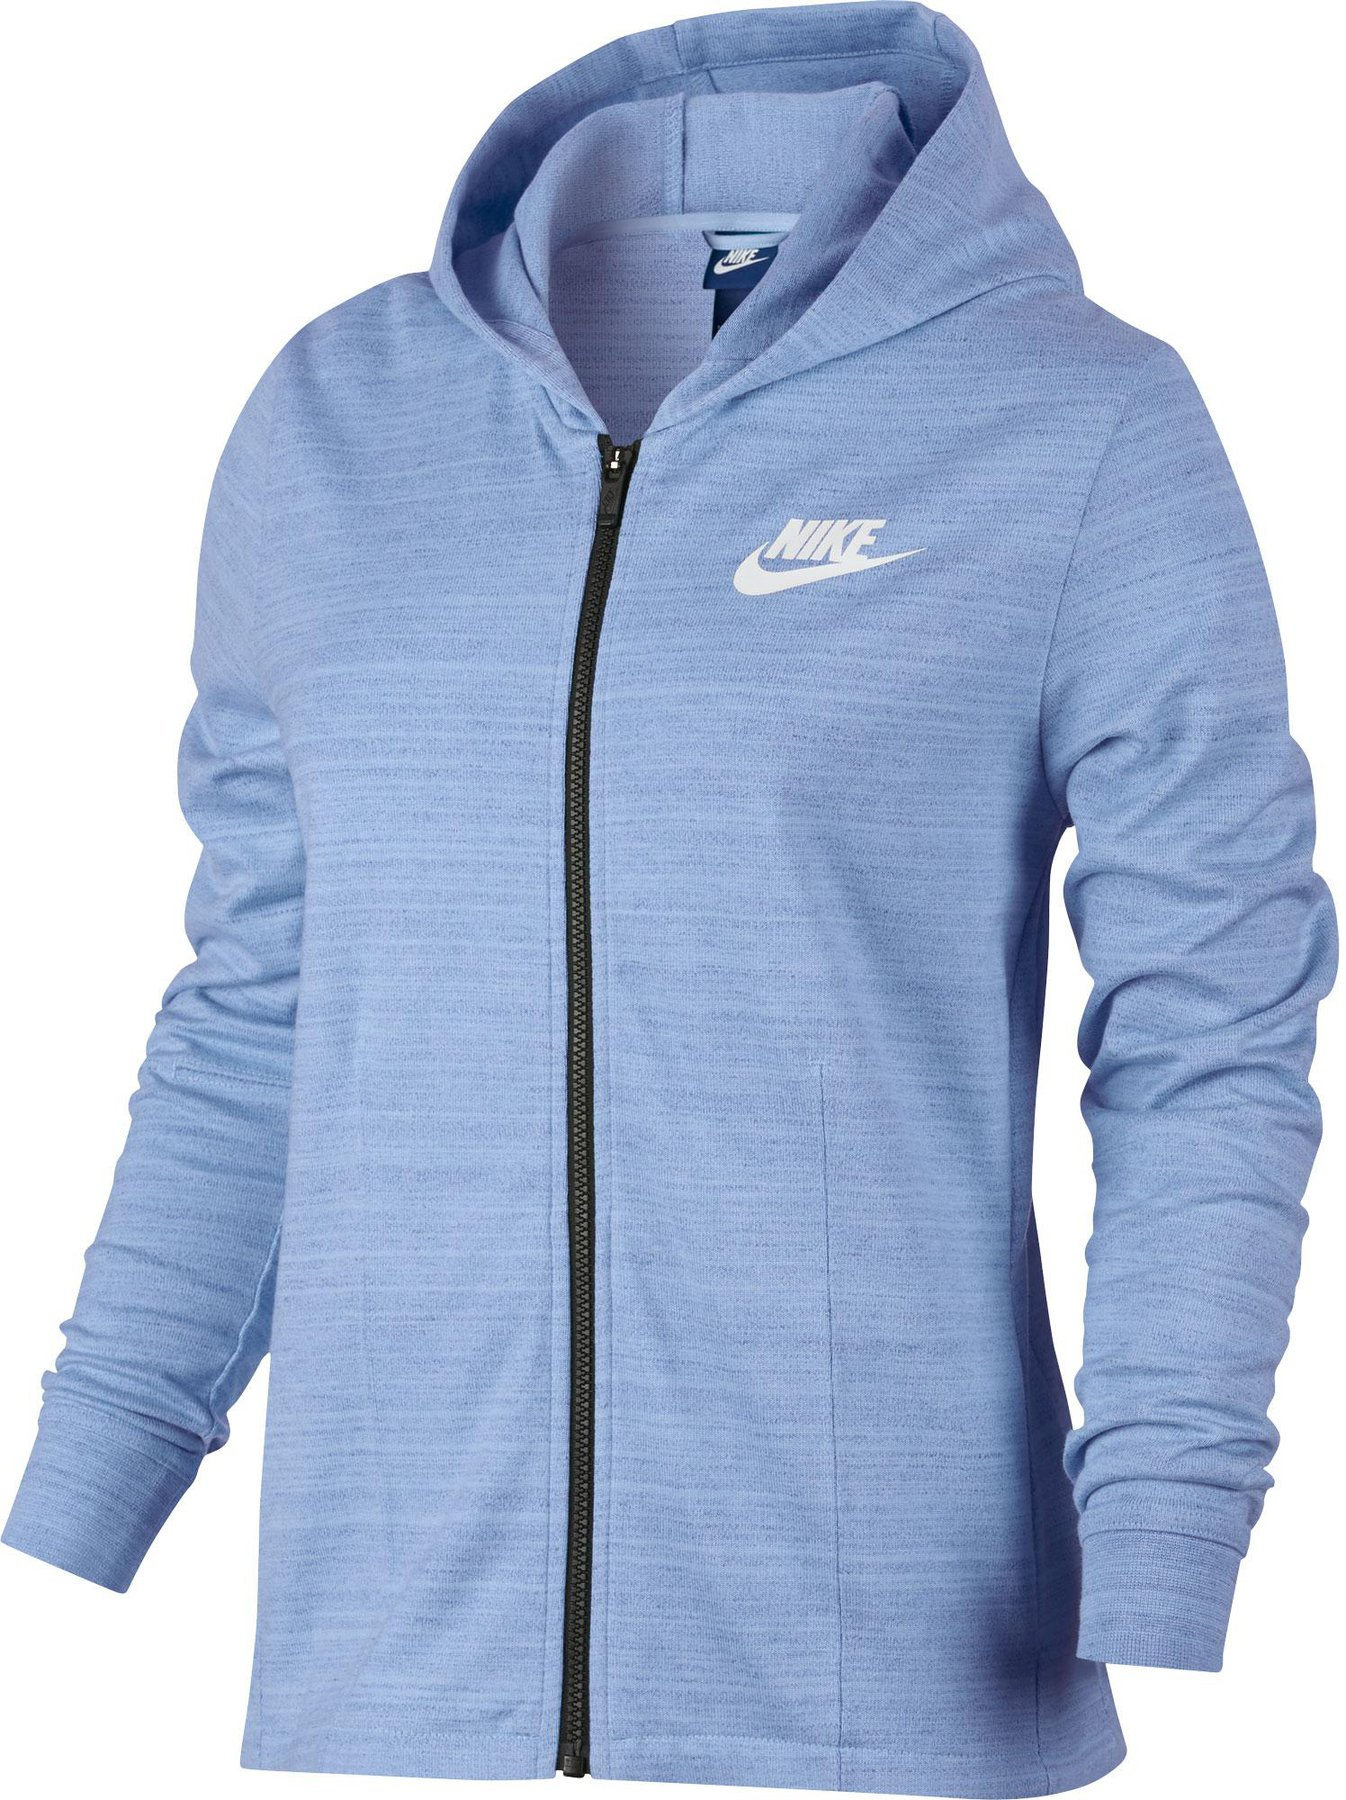 official photos f1d41 8f46b Nike Sweatjacke Damen kaufen   Günstig im Preisvergleich